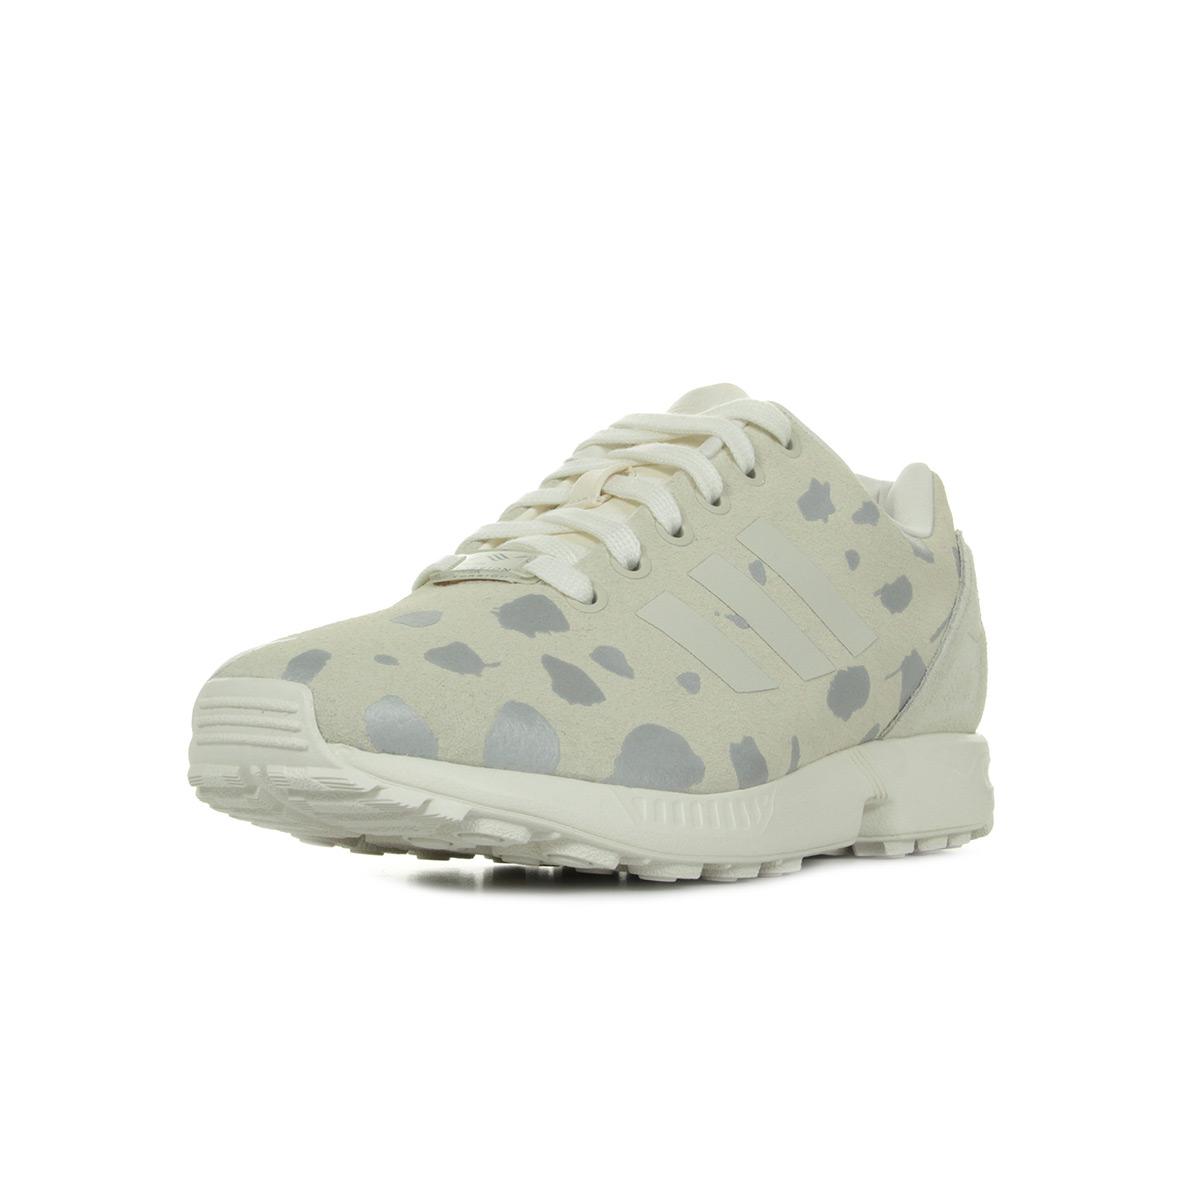 meet e9579 facd4 Chaussures Baskets adidas femme Zx Flux taille Beige Cuir Lacets